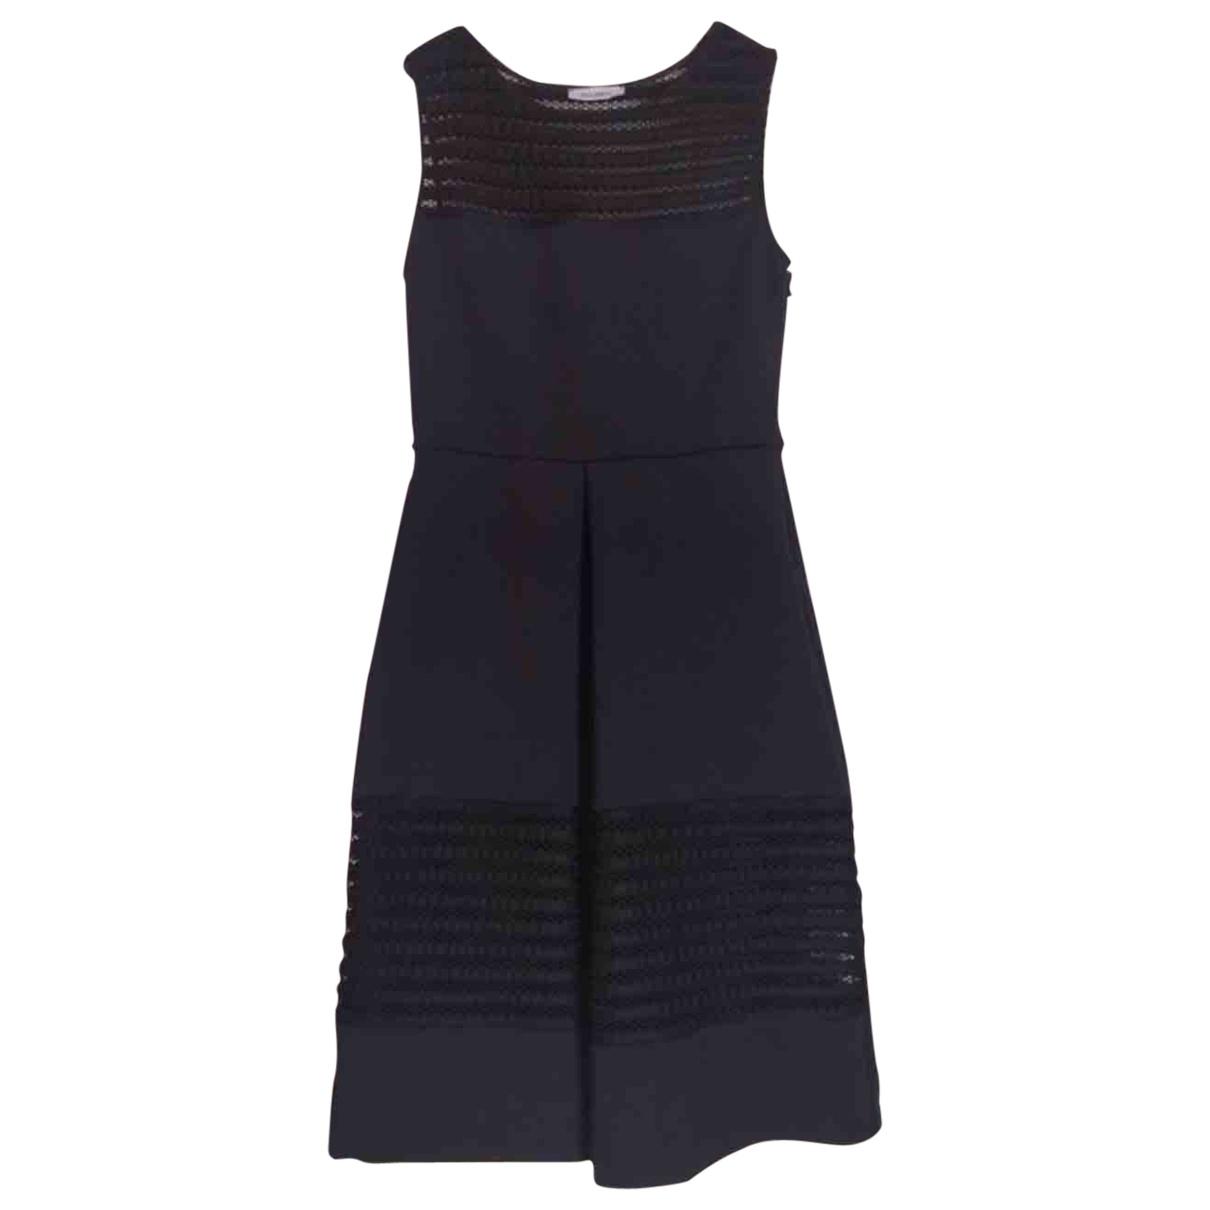 Max & Co \N Blue Cotton - elasthane dress for Women XS International